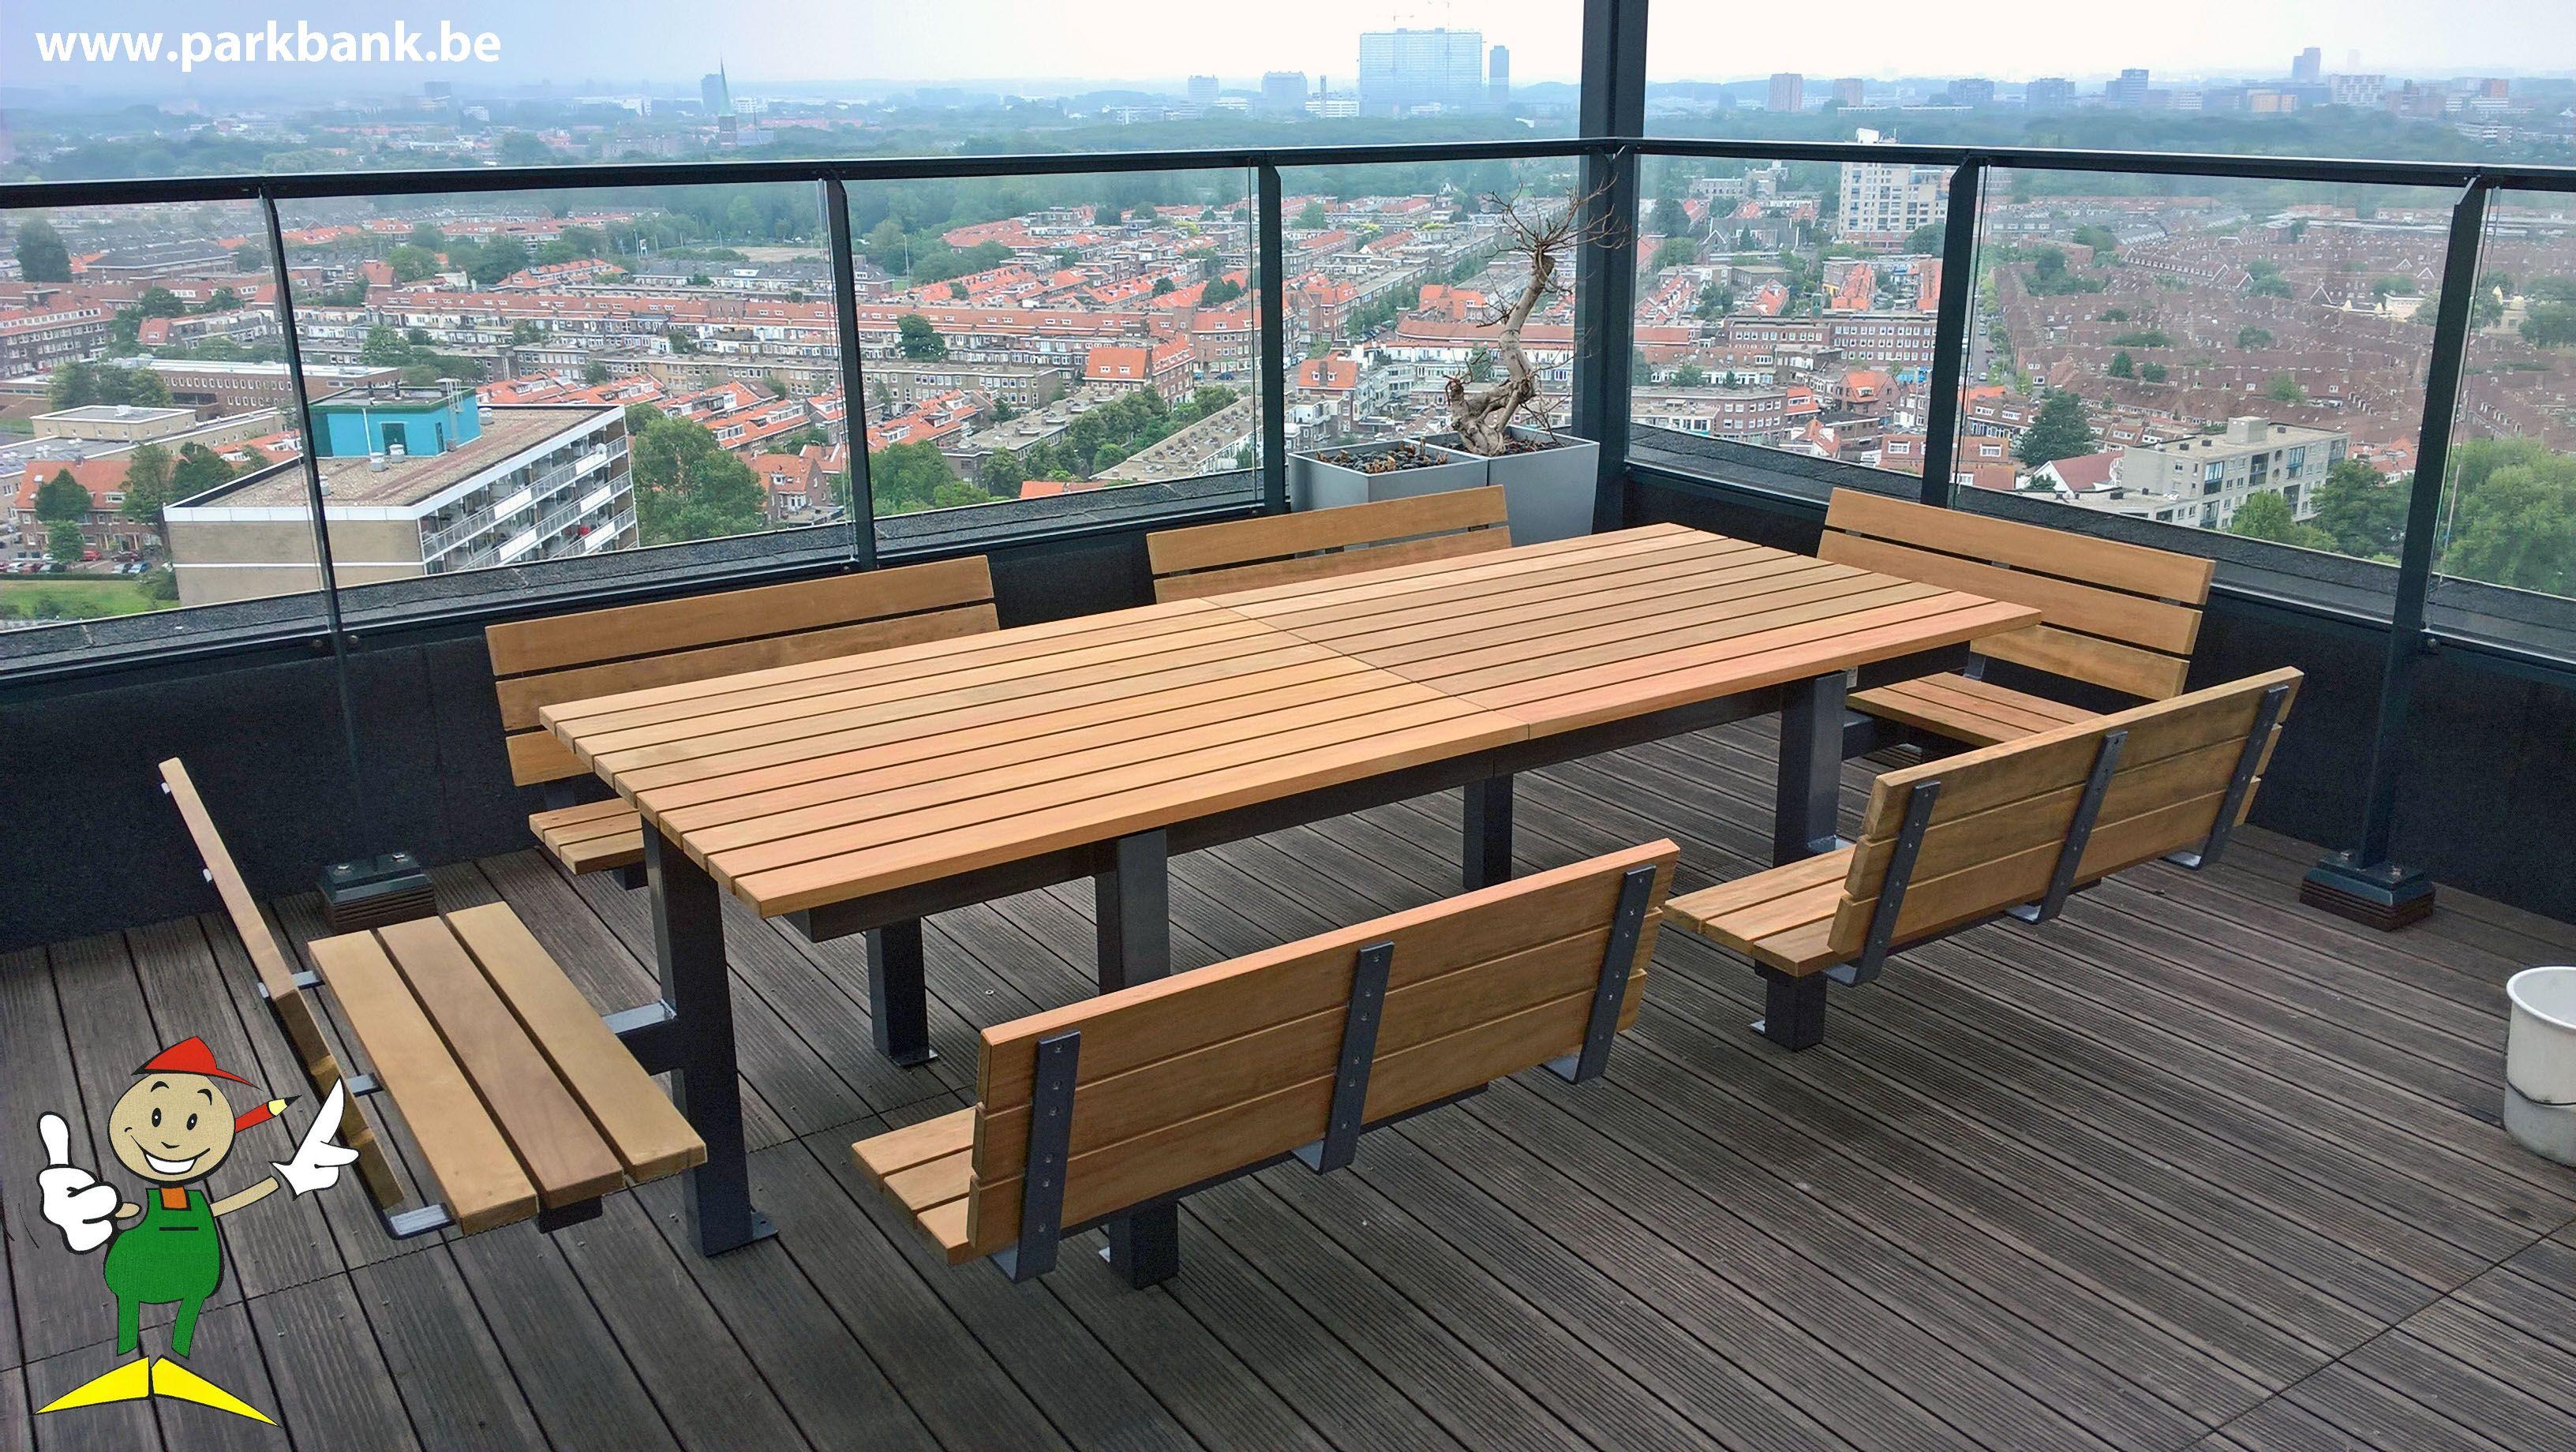 Charmant Eettafel Design Picknicktafel Terrastafel Www.parkbank.be